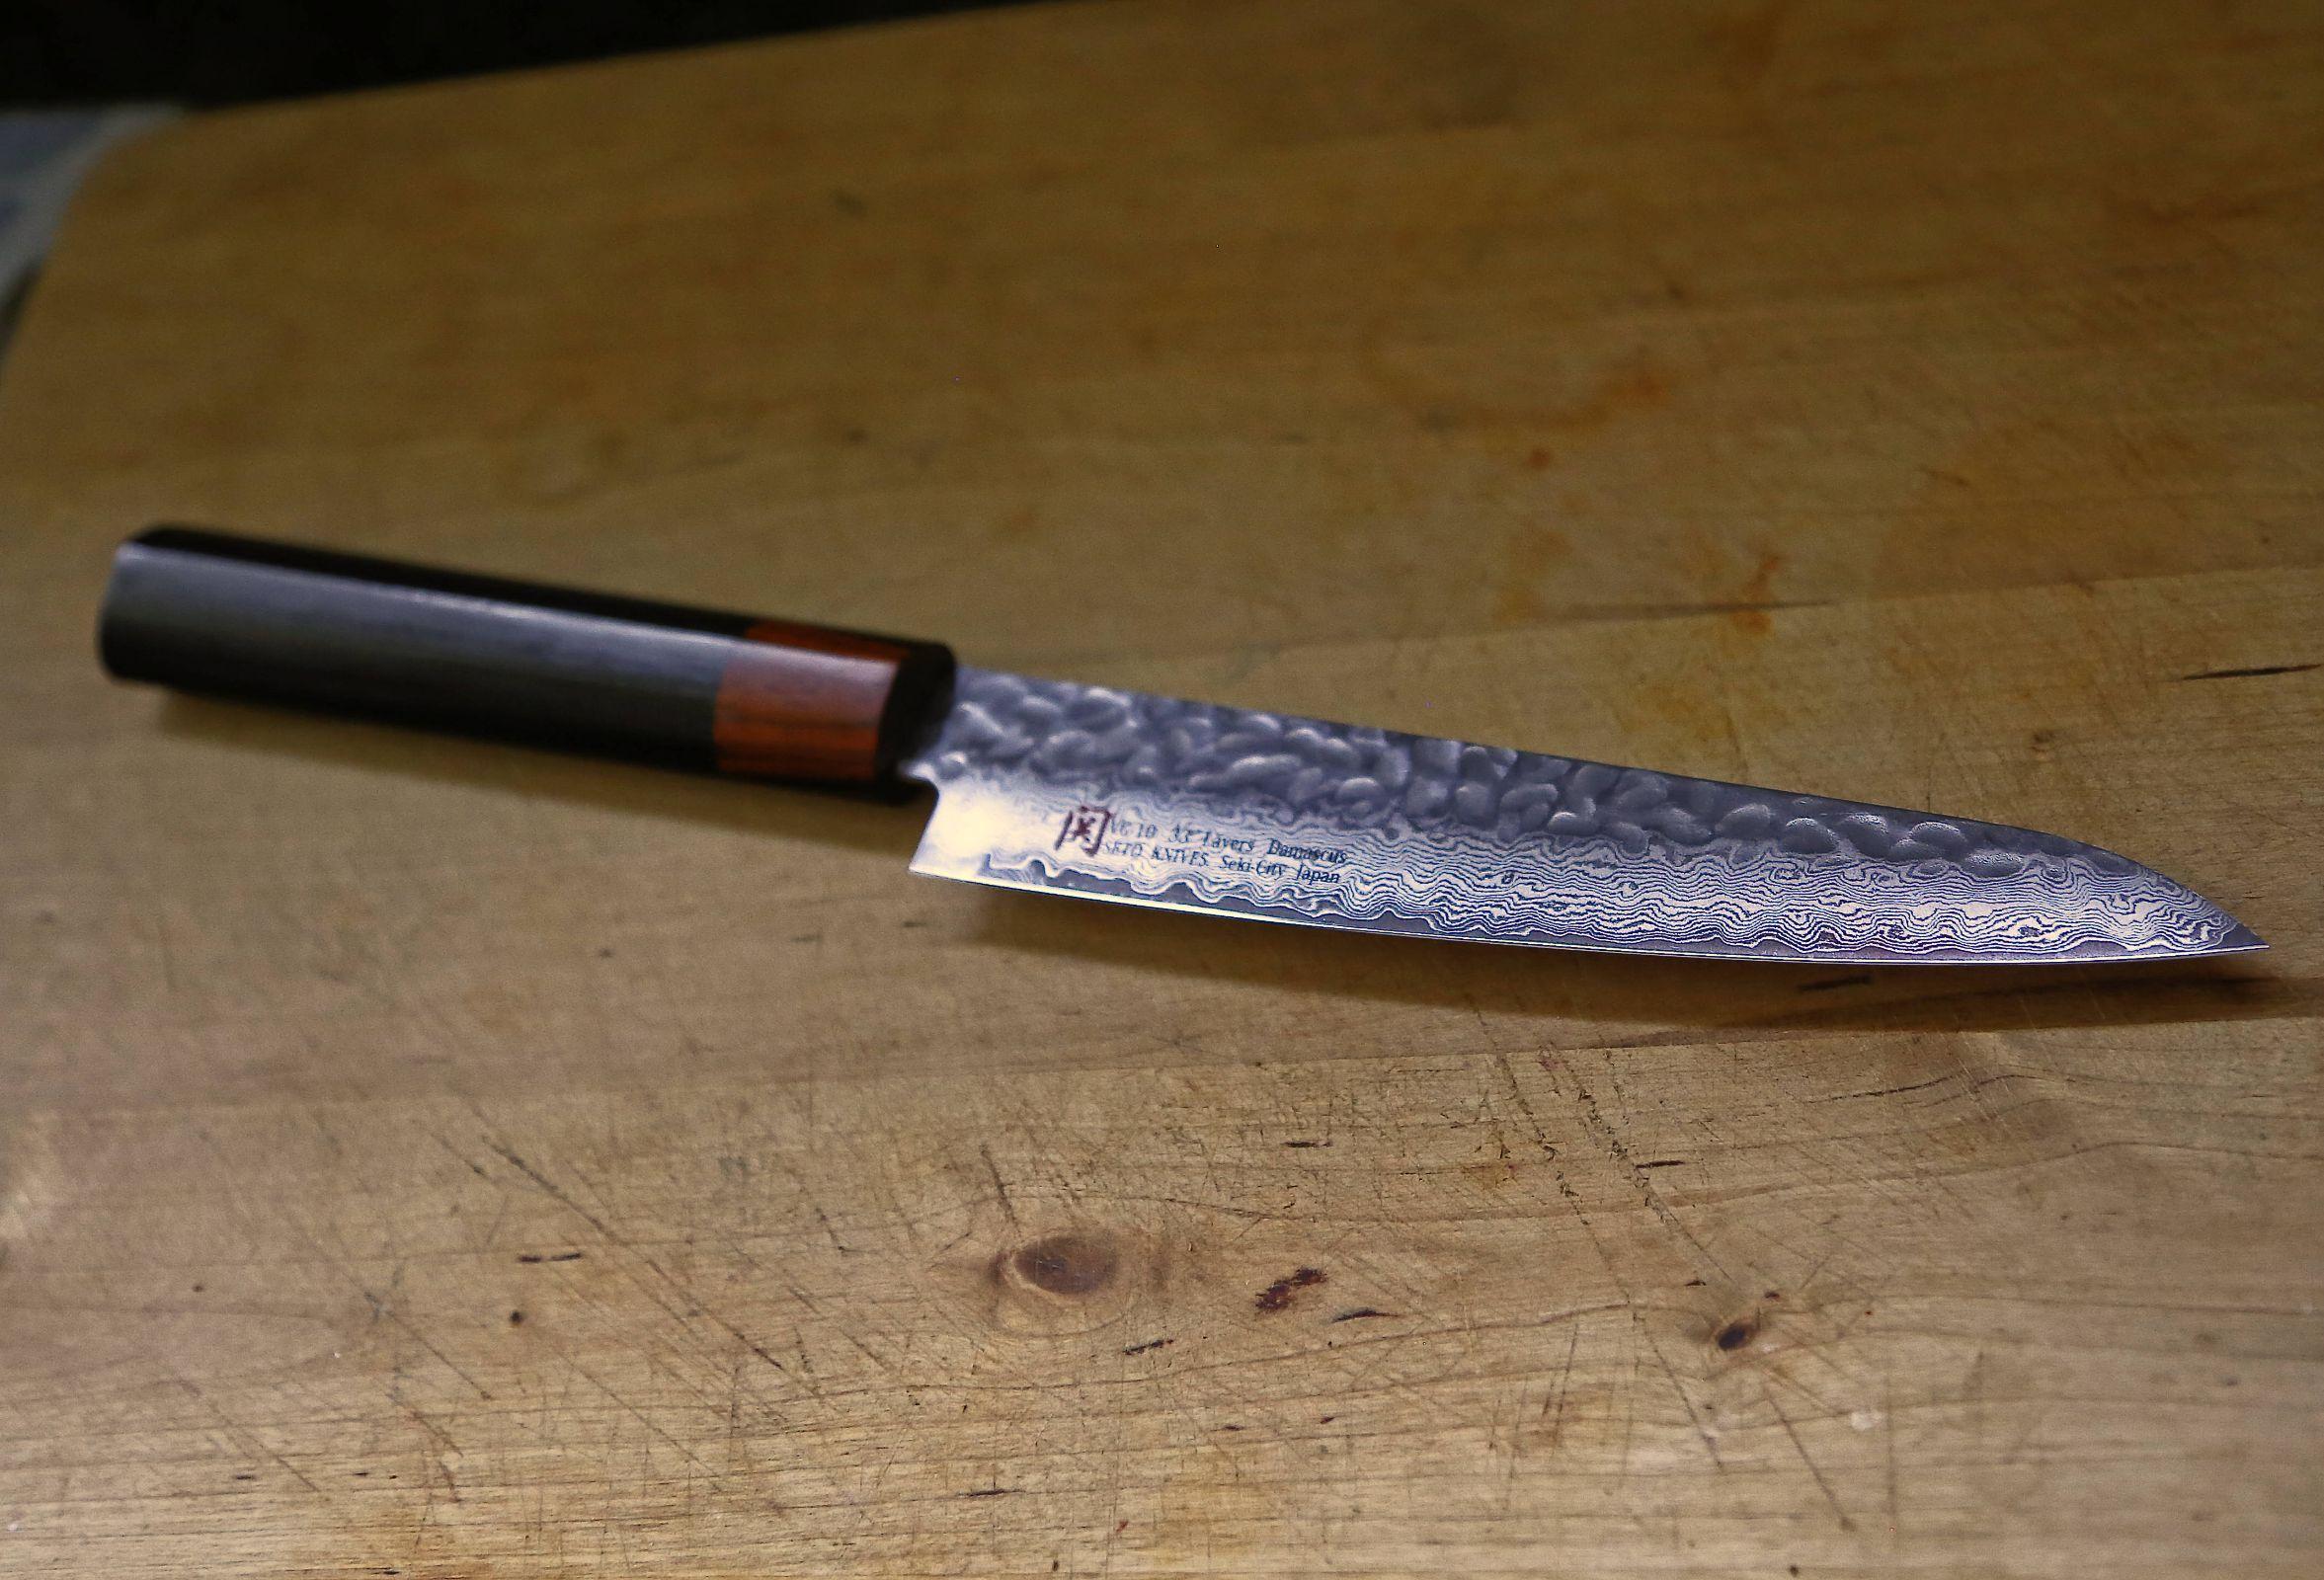 Japanese Seto Petty Knife, Damascus Forged Steel, 33 layers